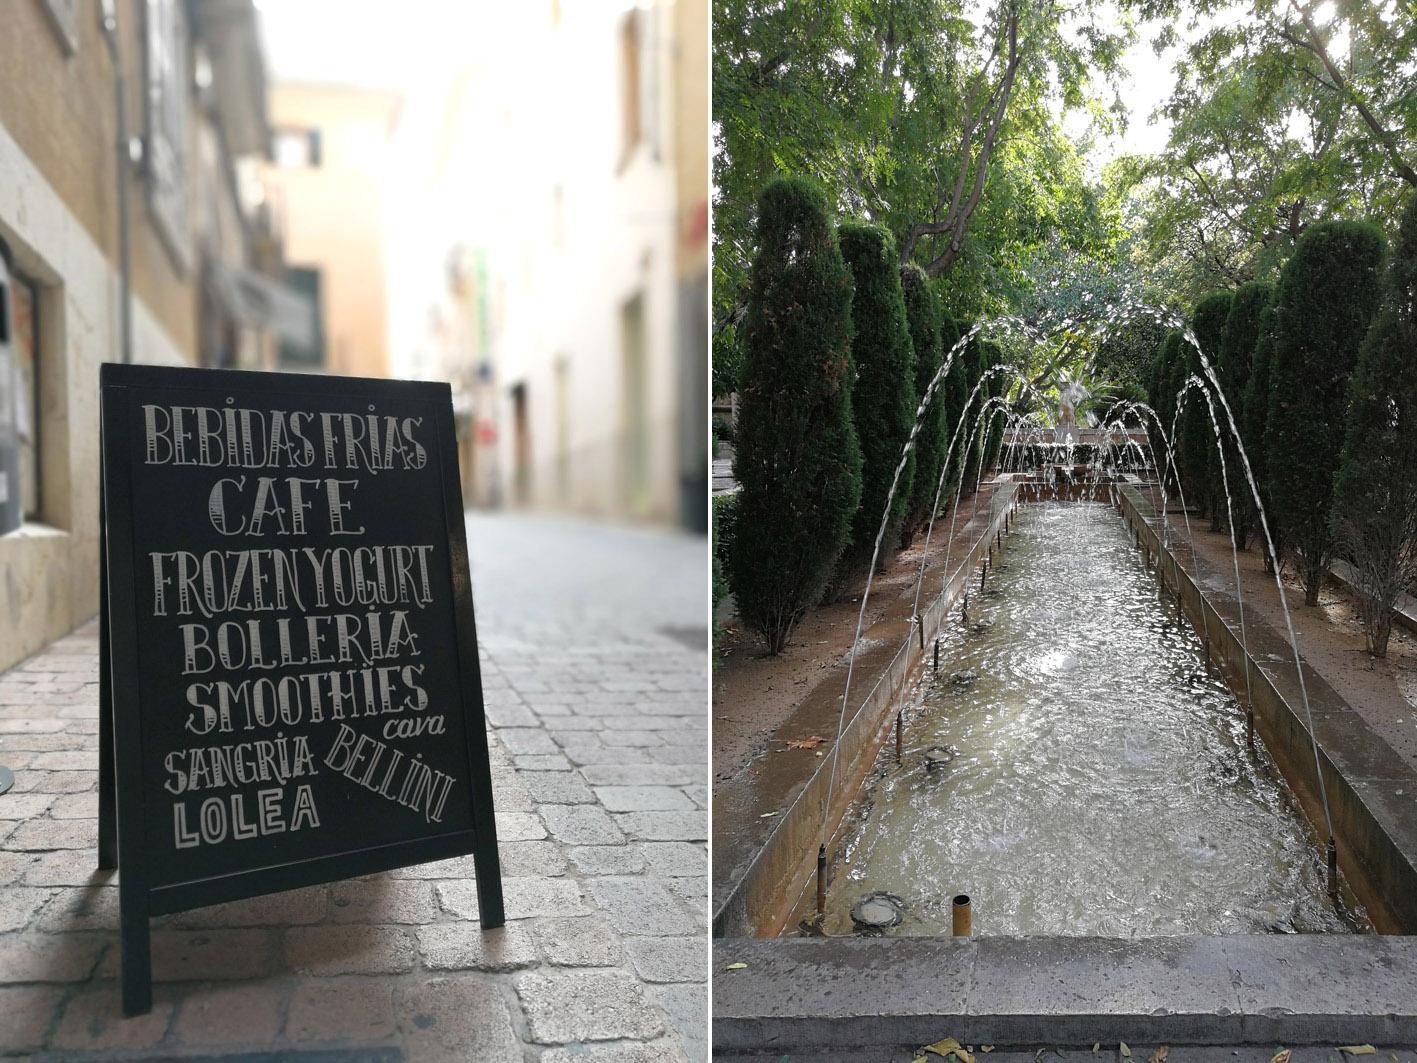 Brunnen in Palma de Mallorca